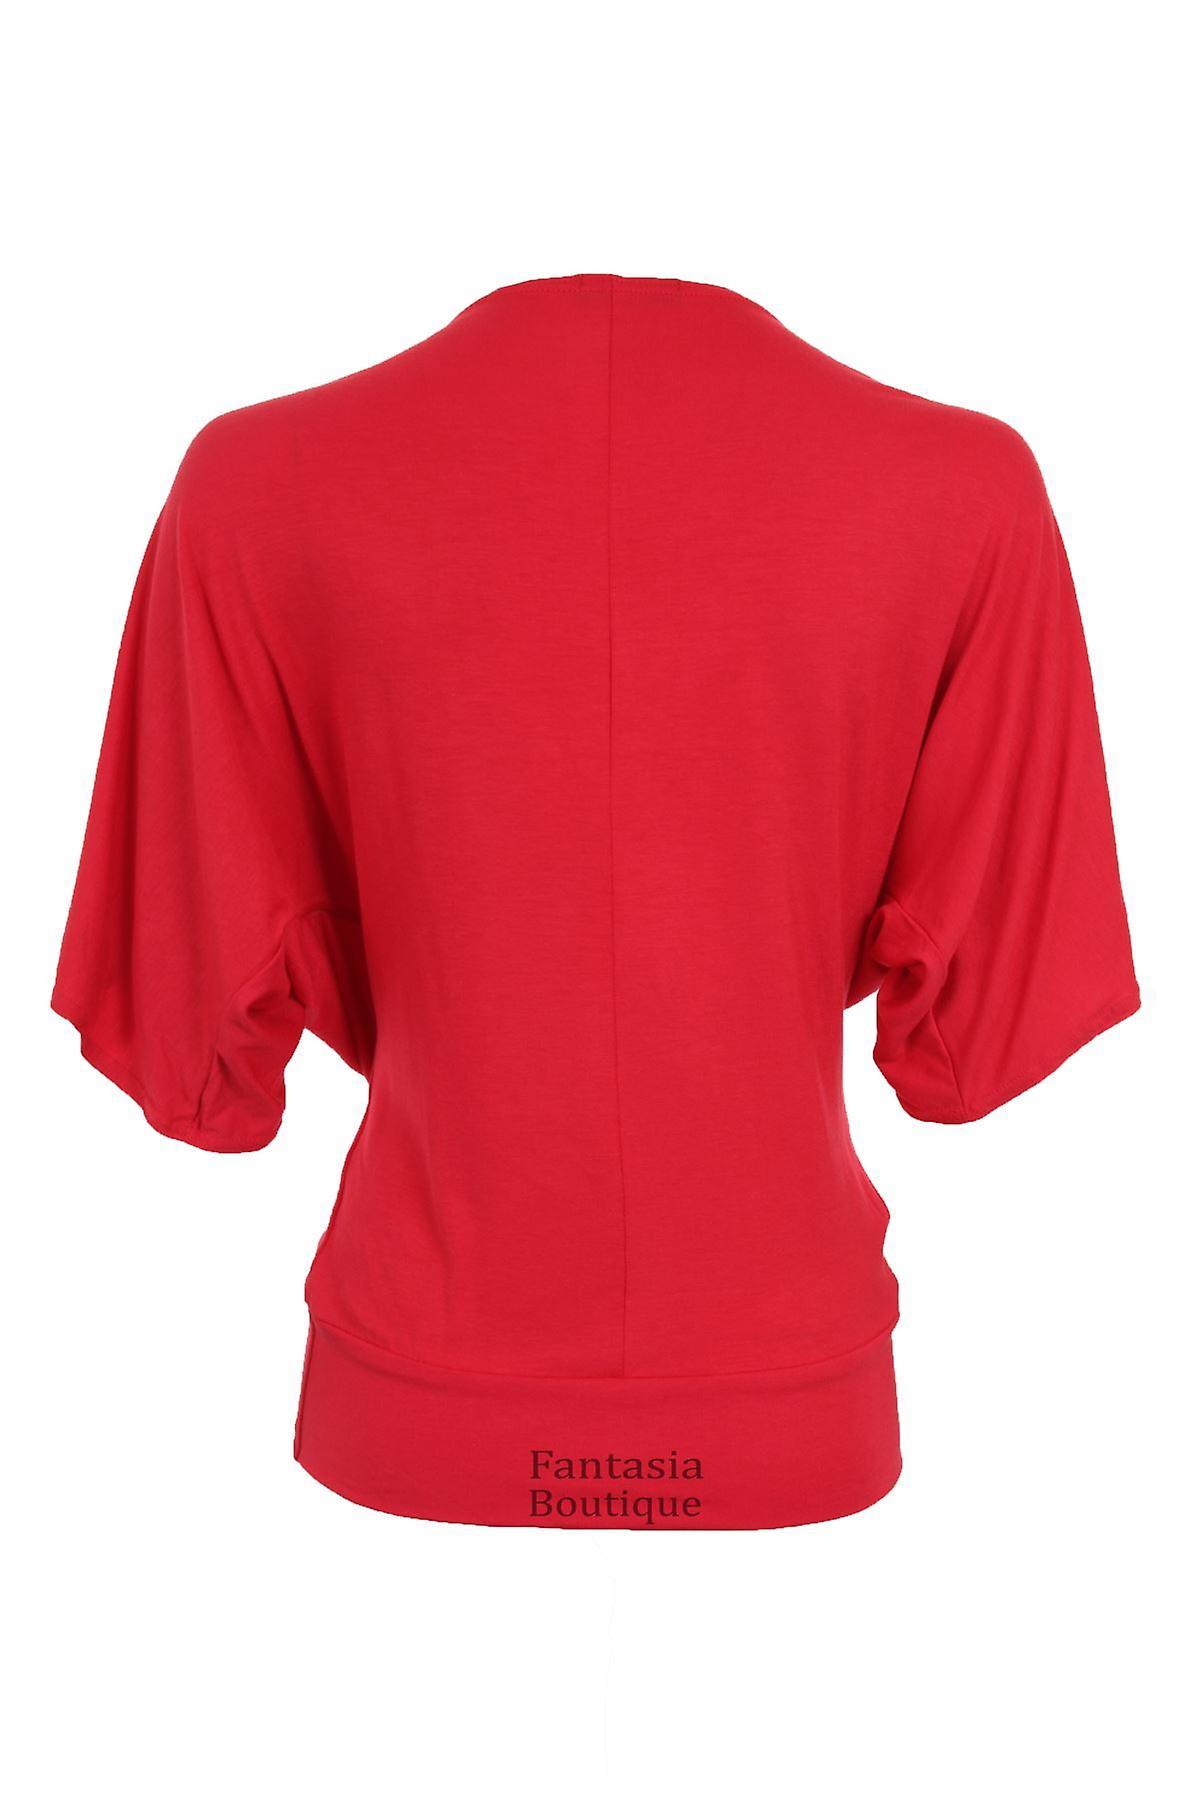 New Ladies Short Sleeve Celeb Print Baggy Women's Top